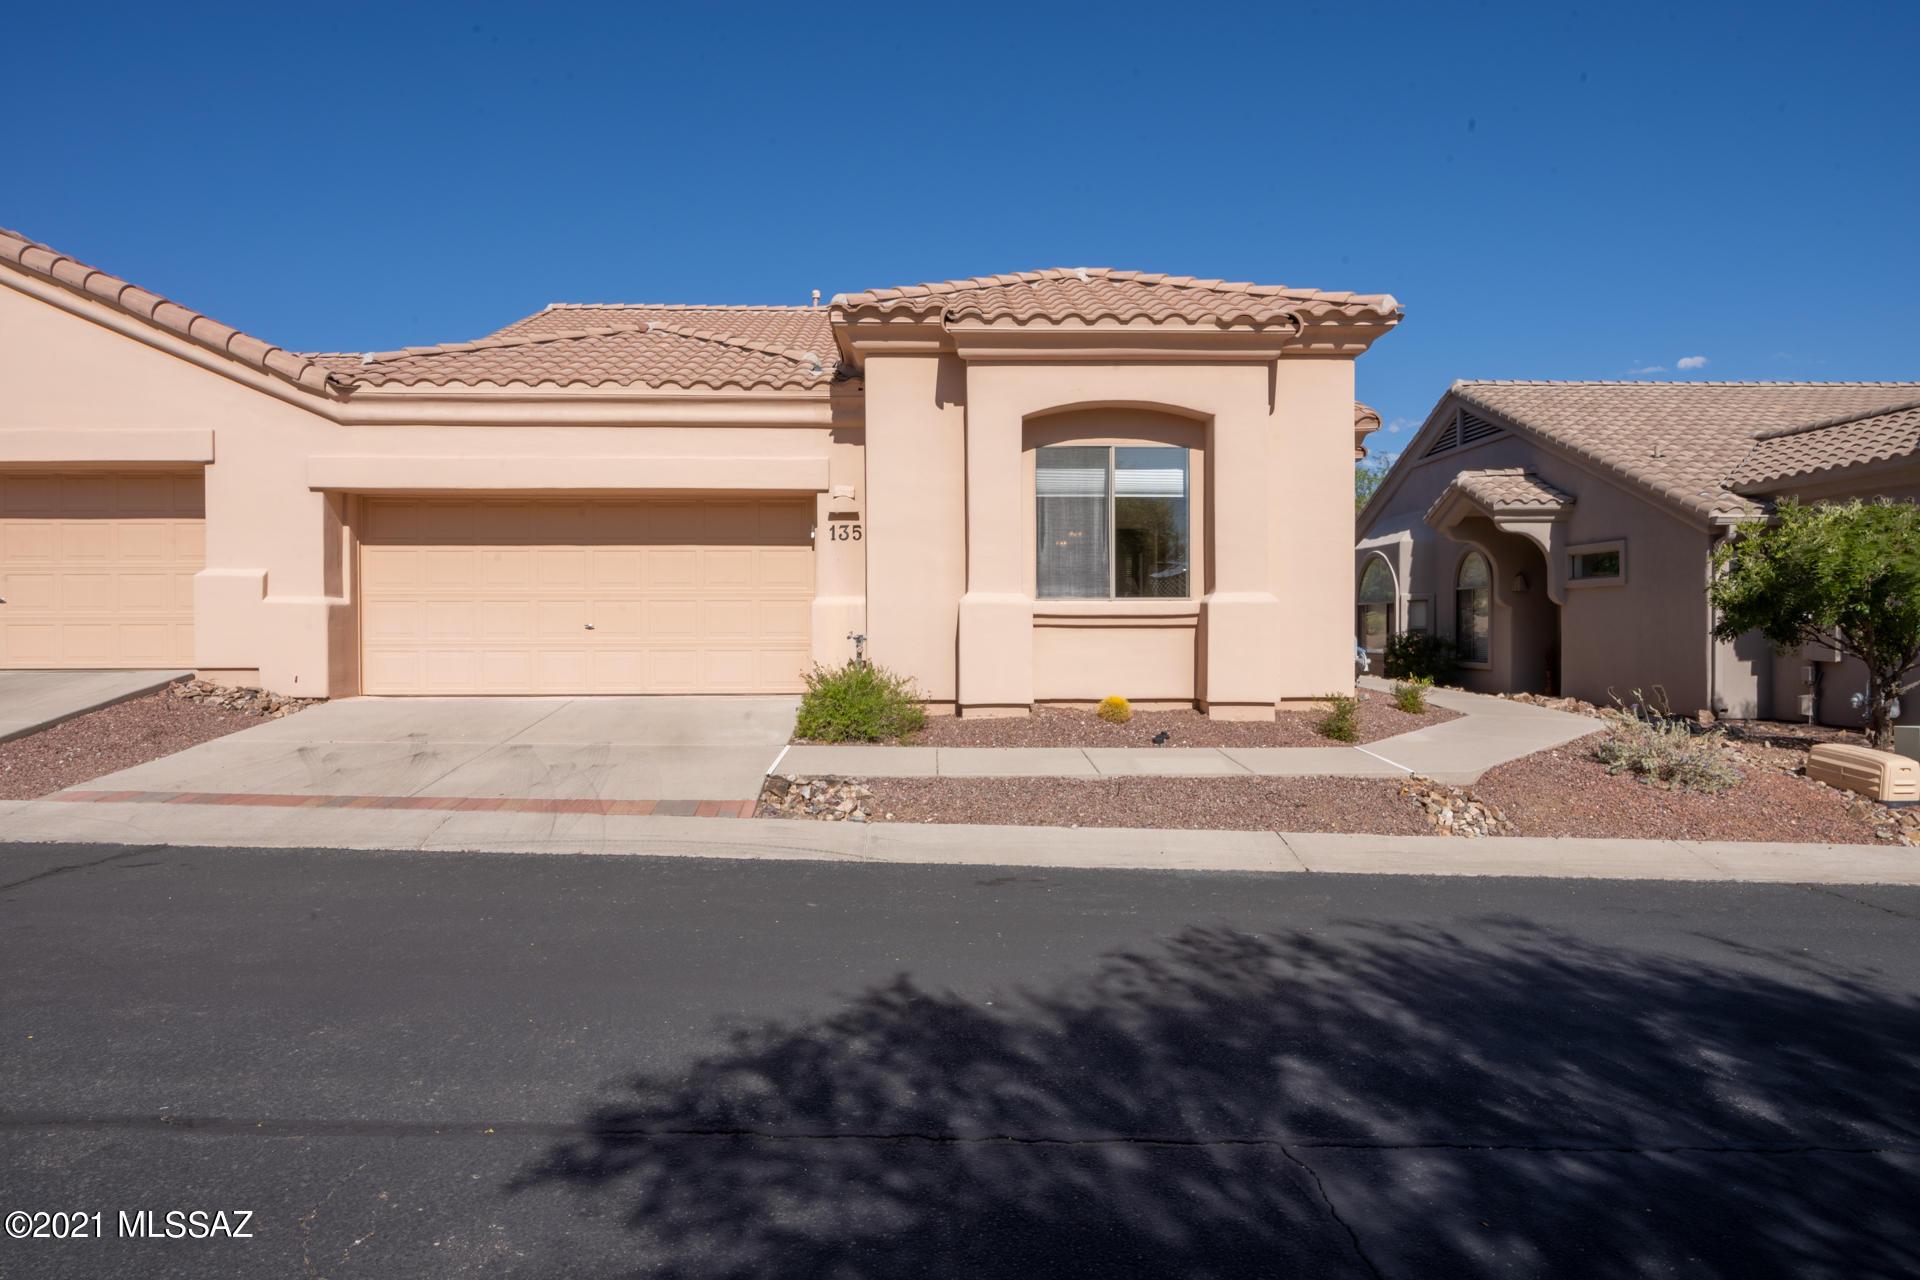 13401 N Rancho Vistoso Blvd